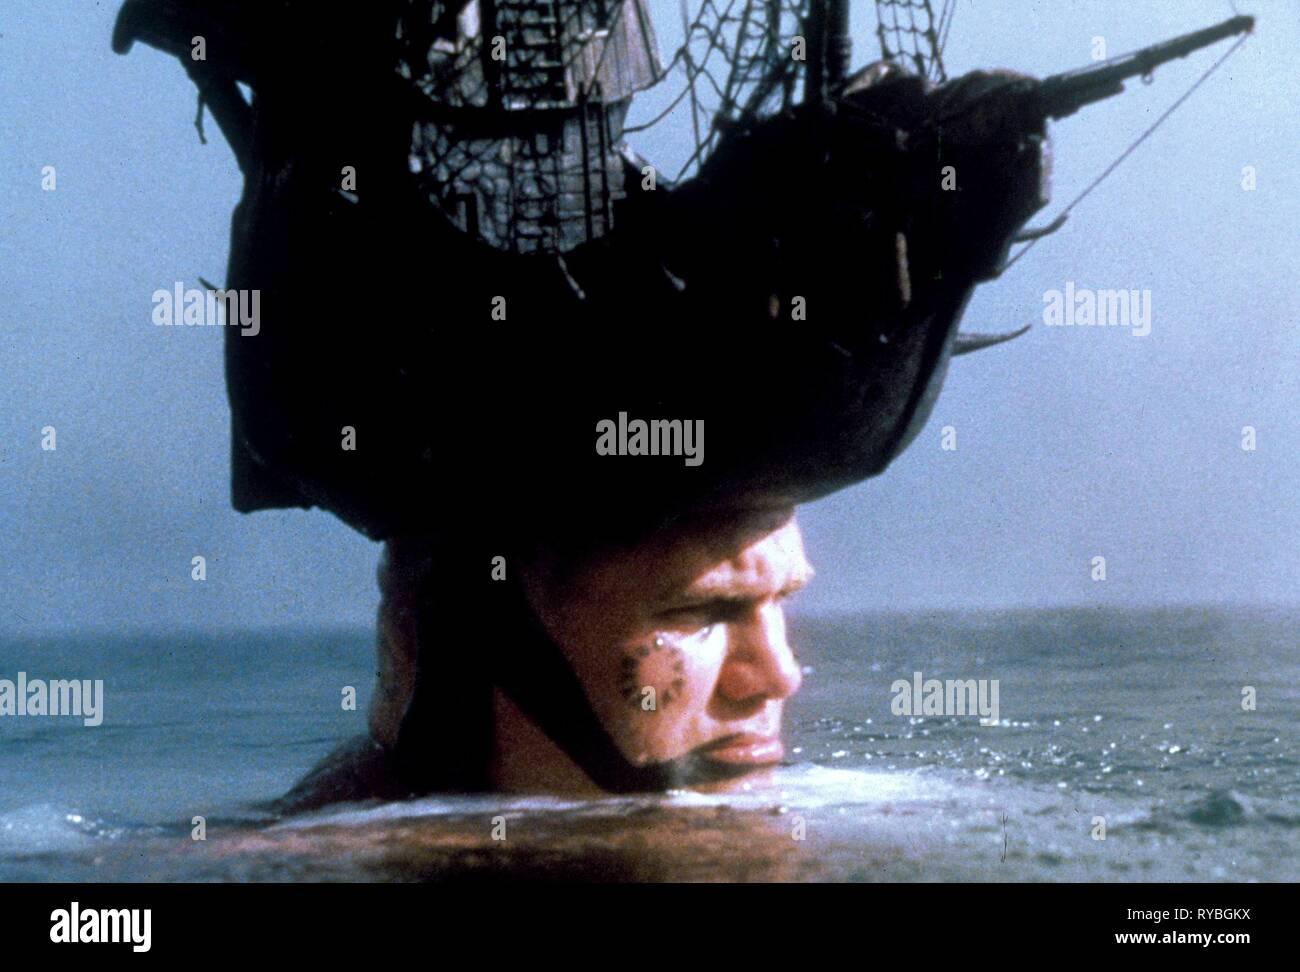 SHIP ON GIANT'S HEAD, TIME BANDITS, 1981 - Stock Image